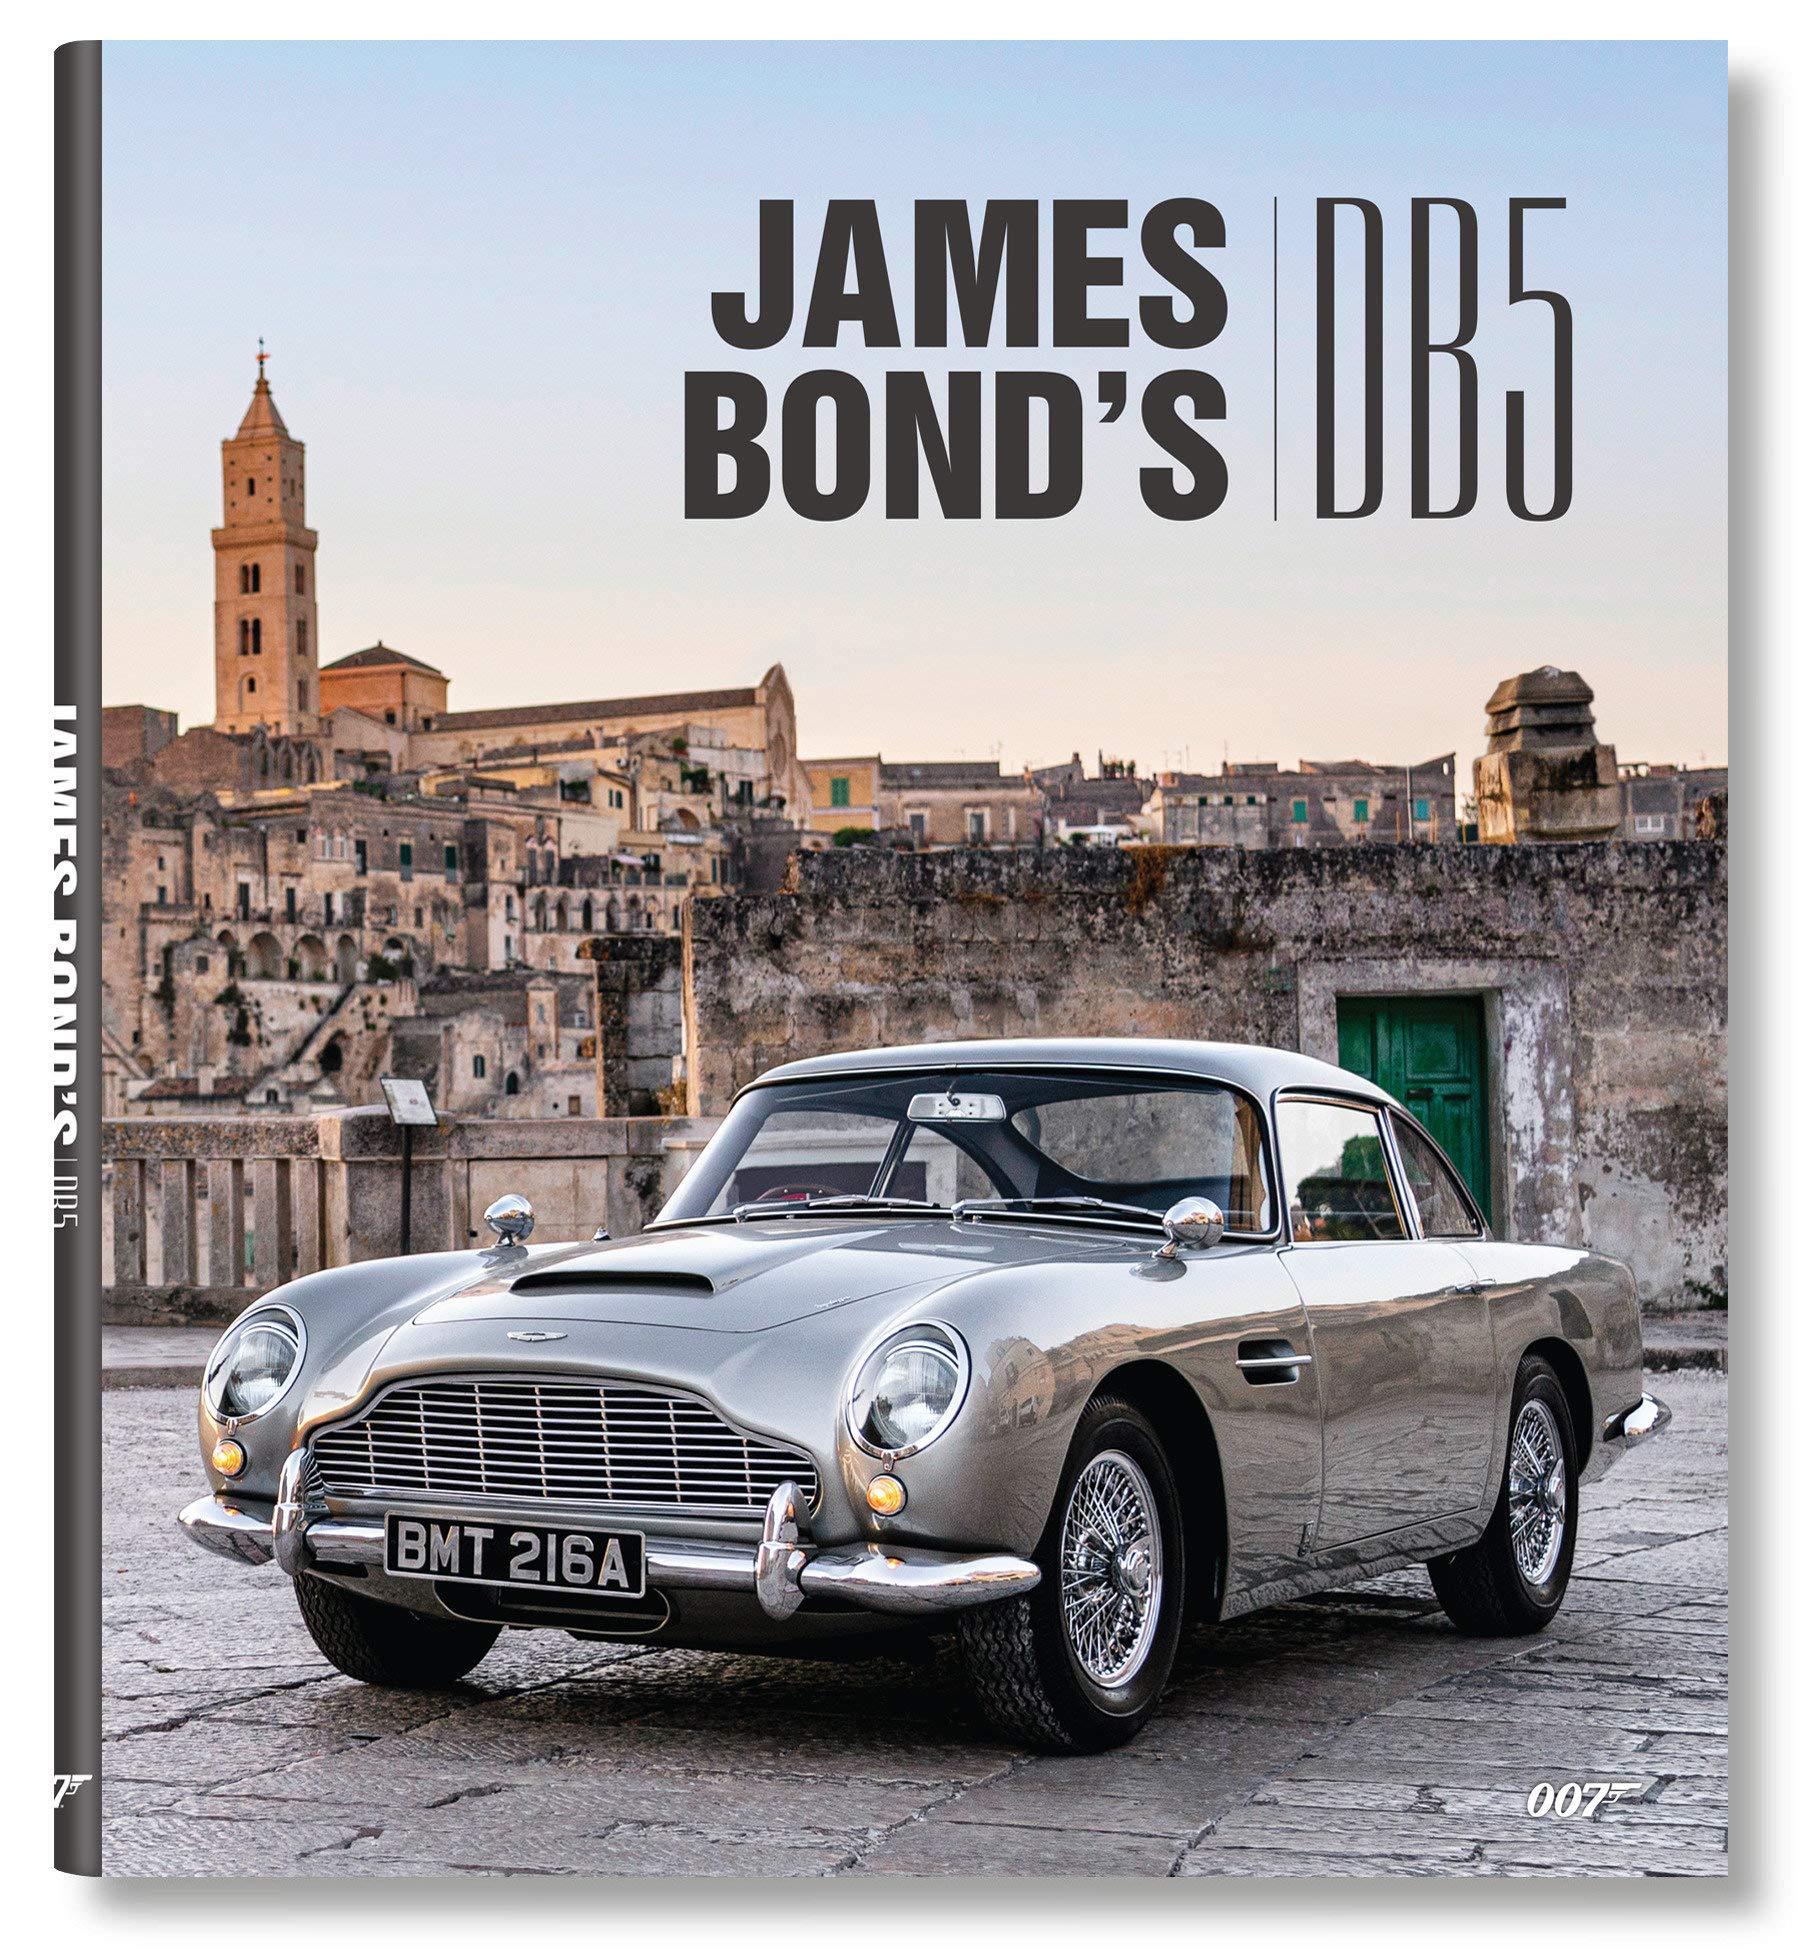 James Bond S Aston Martin Db5 Amazon De Hugo Simon Lawrence Will Fremdsprachige Bücher